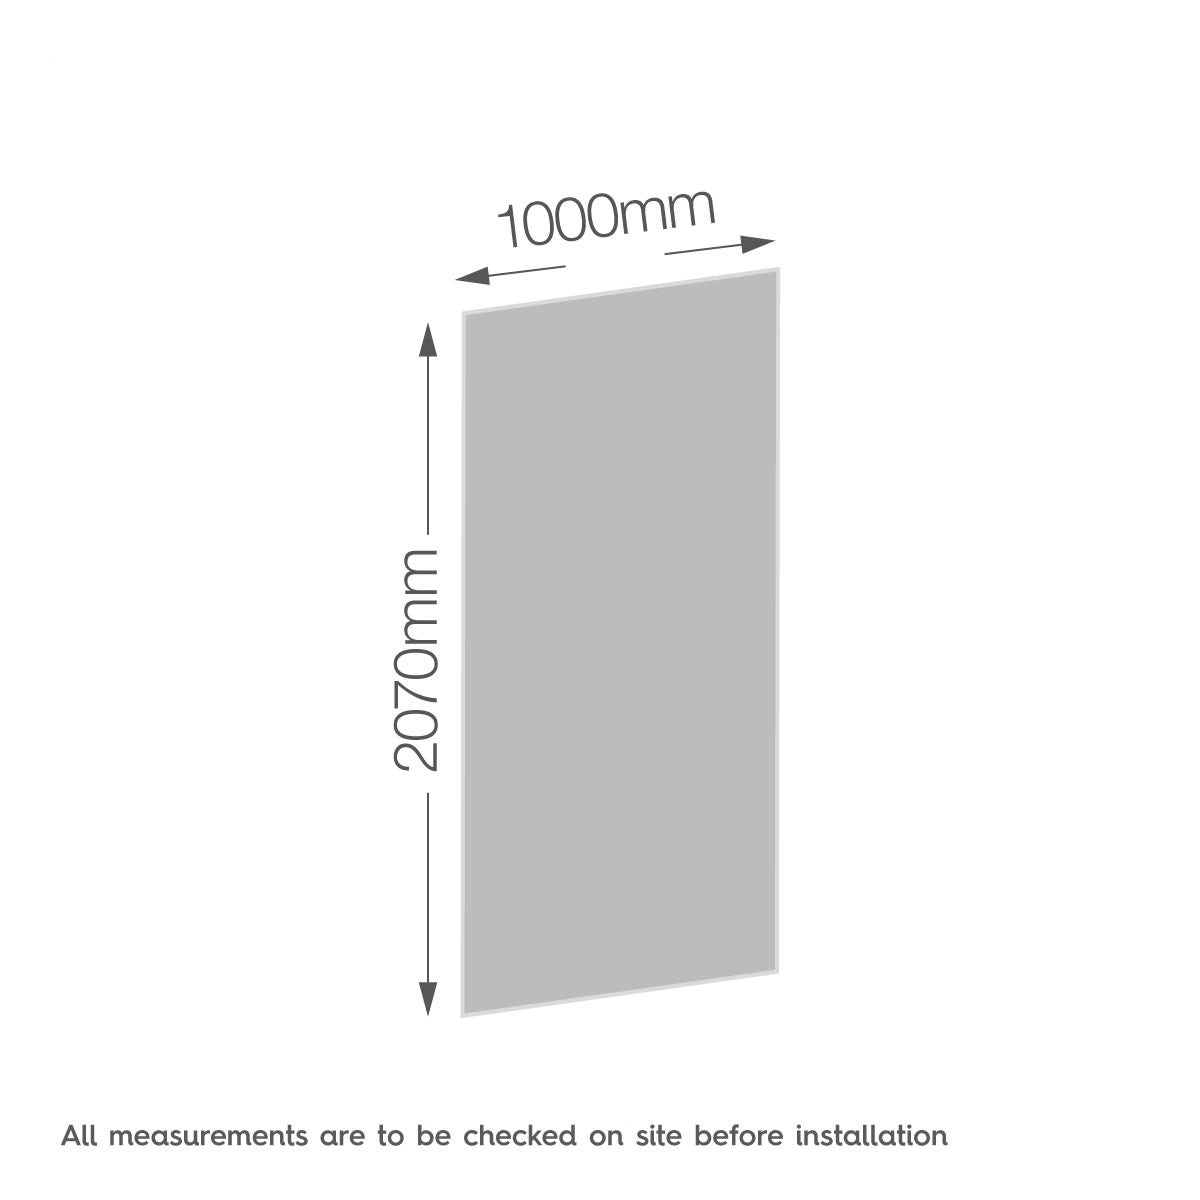 Dimensions for Zenolite plus stone acrylic shower wall panel 2070 x 1000